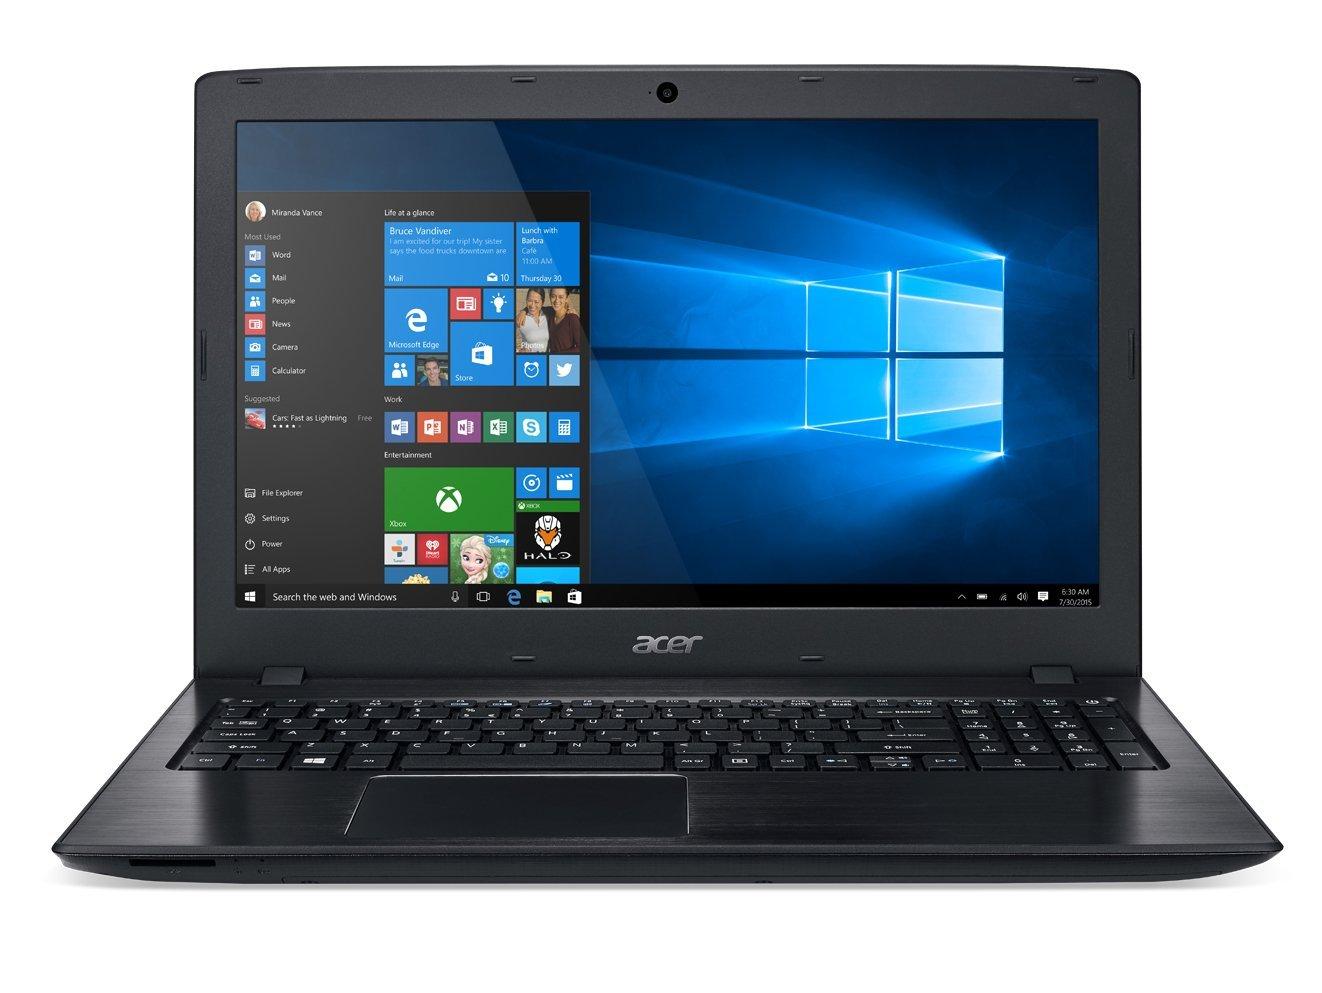 Acer Aspire E 15 E5-575G-53VG Laptop: 15.6 1080p, Intel Core i5-6200U, NVIDIA 940MX, 8GB DDR4, 256GB SSD, Win 10 $533 + Free Shipping @ Amazon